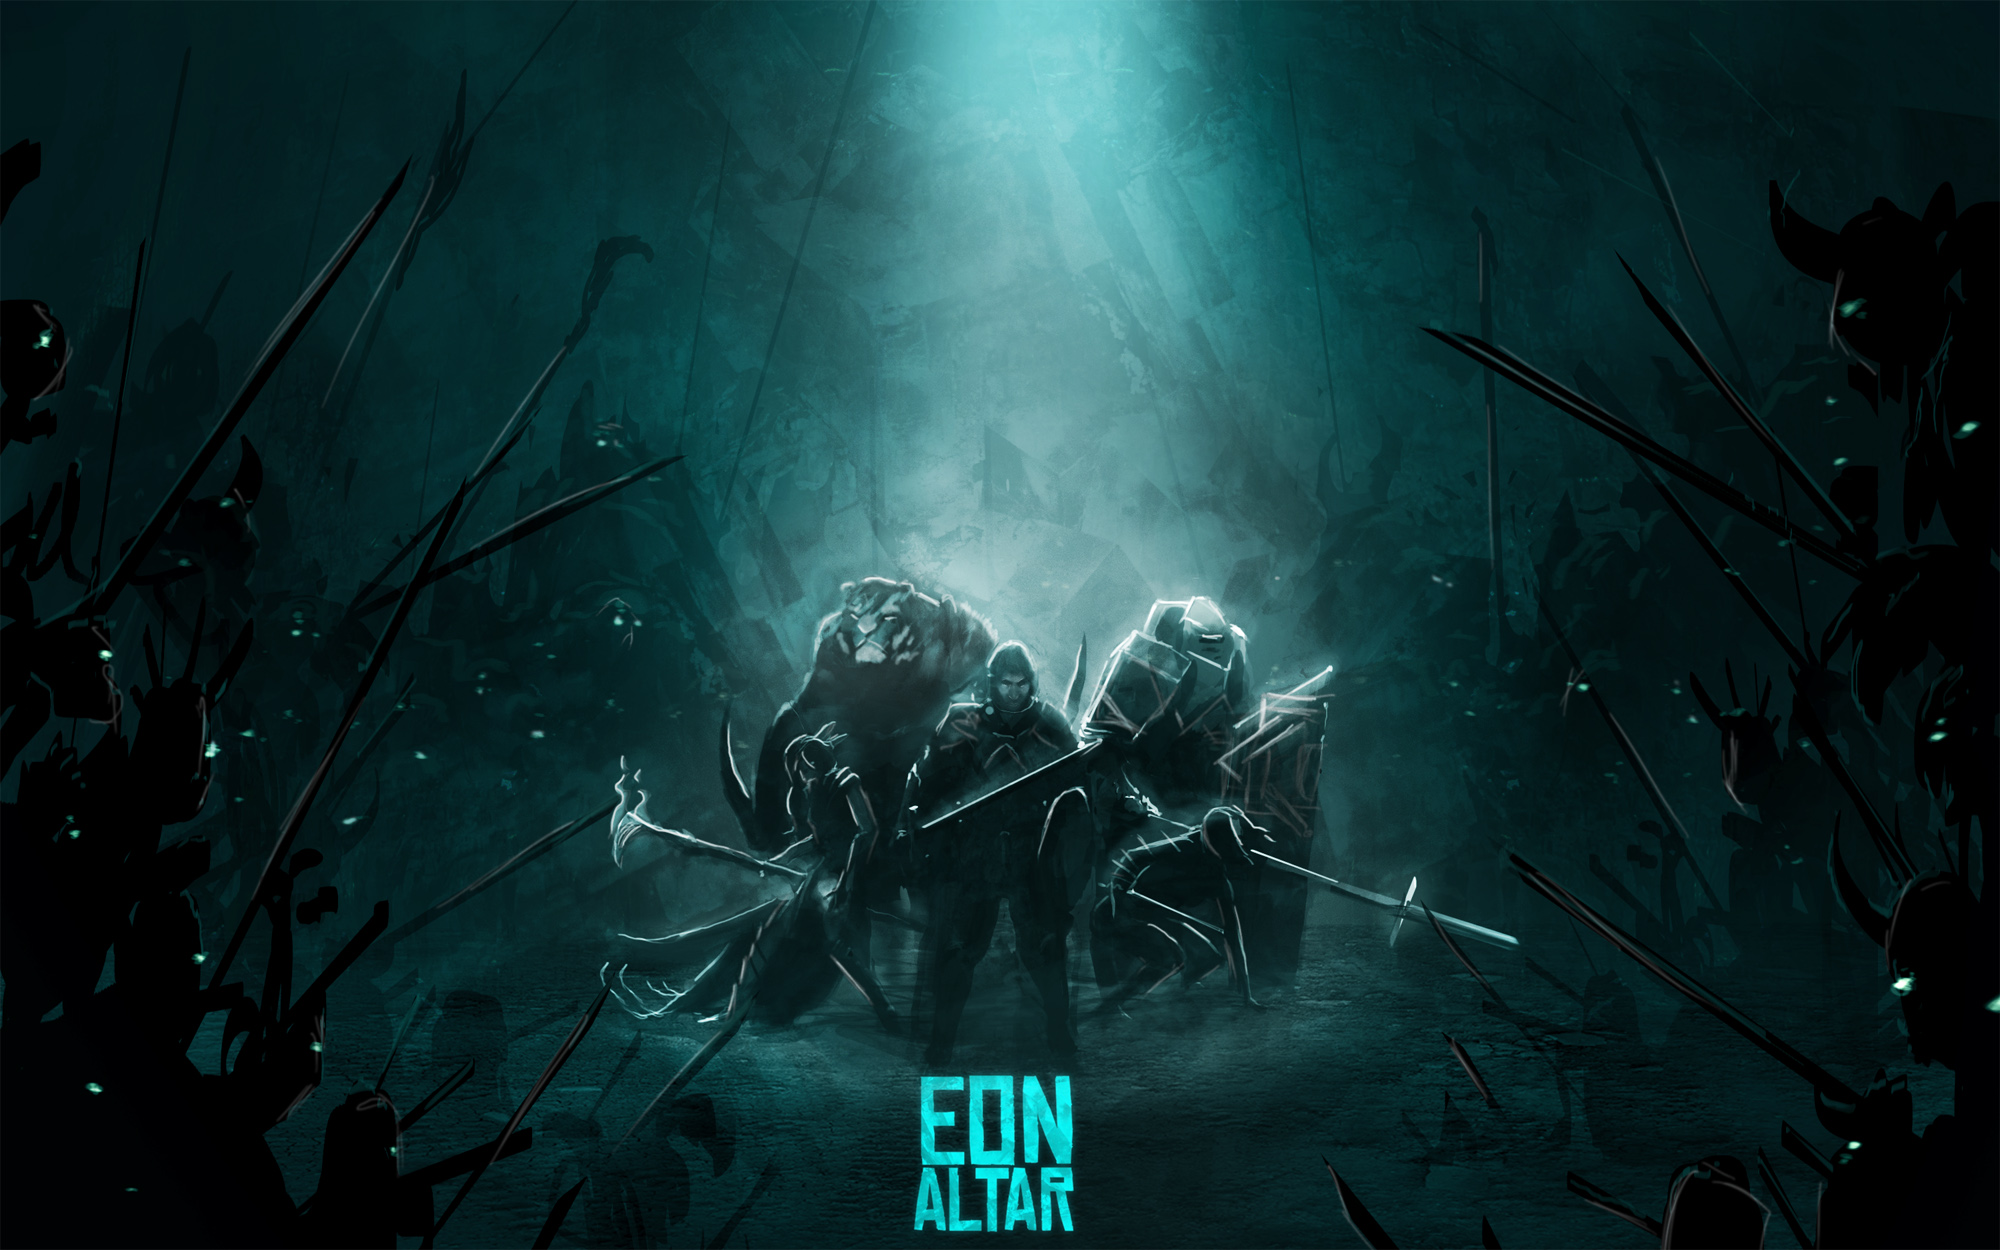 Eon_Altar_Team_Art2K